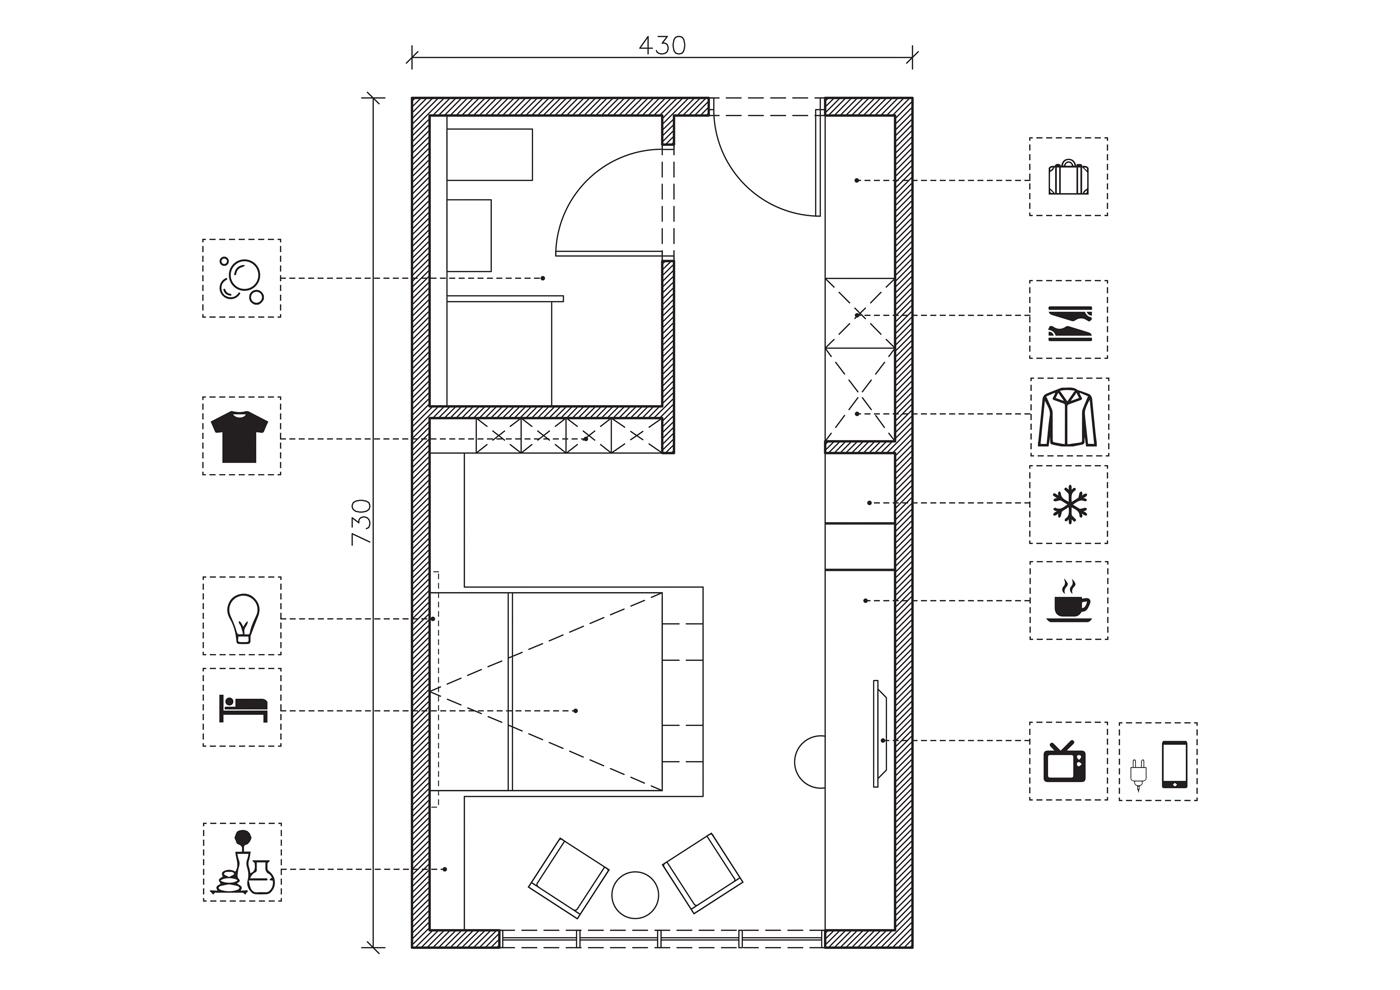 6_ROYDAVID_Eurostars-plan.jpg